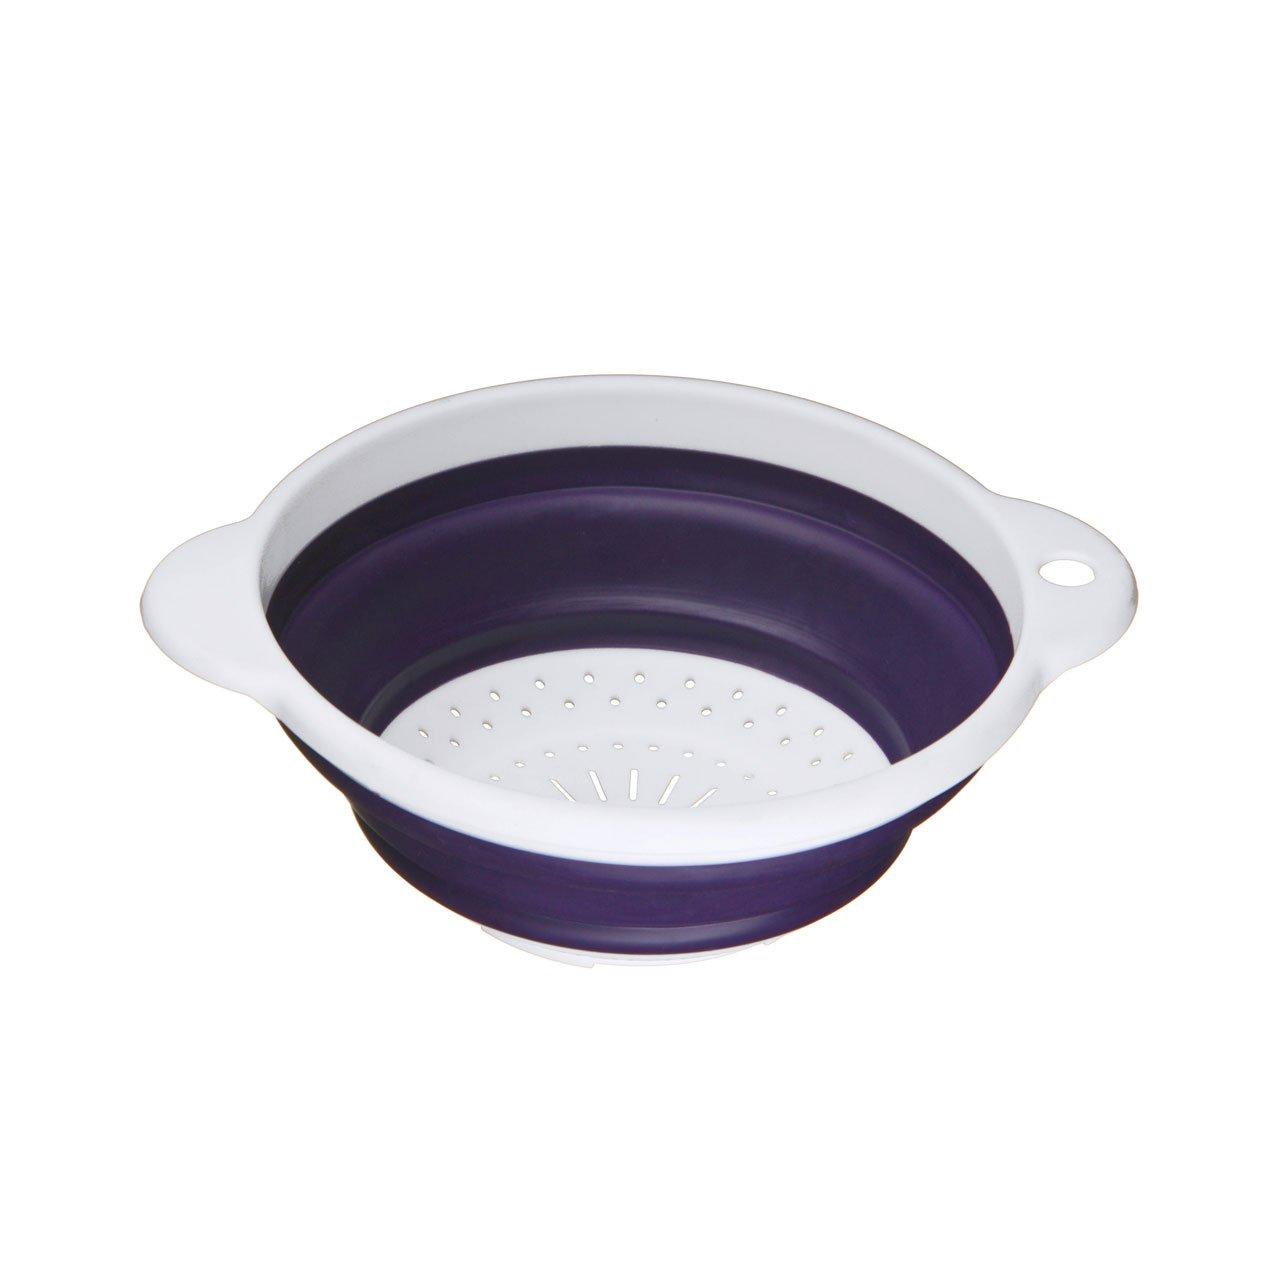 7 PCSkochbesteck-SetAssistant de cuisine-SetArgenten acier inoxydable